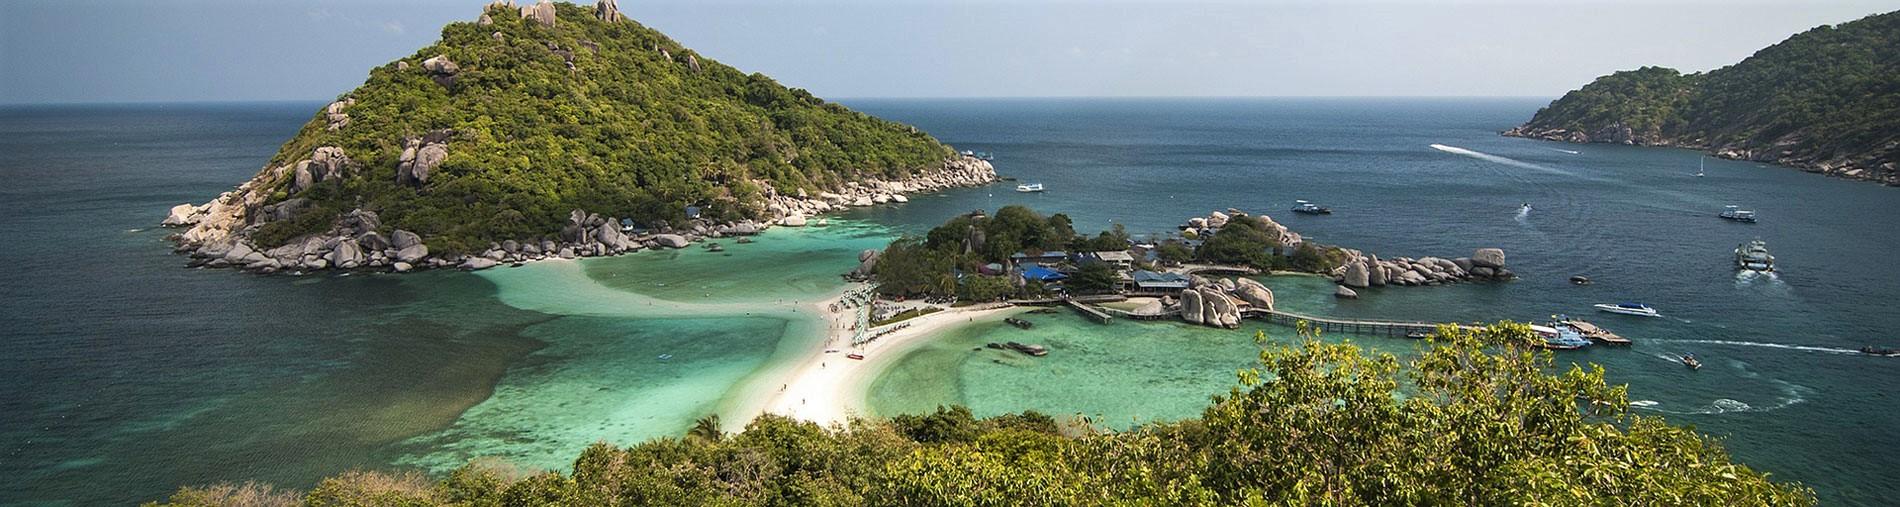 rondreis thailand hoogtepunten header 1